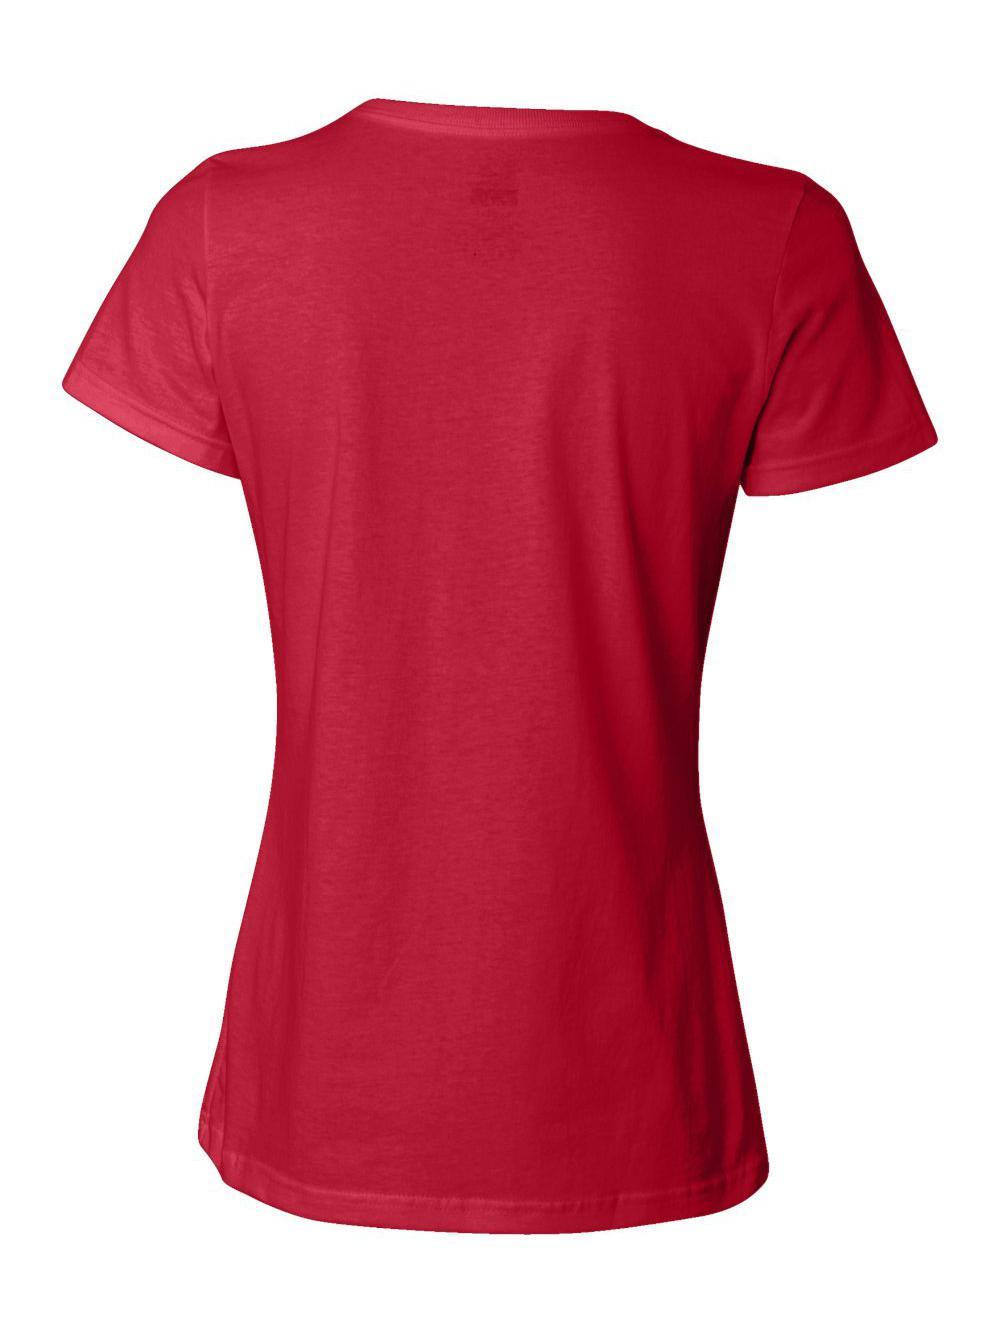 Fruit-of-the-Loom-HD-Cotton-Women-039-s-Short-Sleeve-T-Shirt-L3930R thumbnail 37